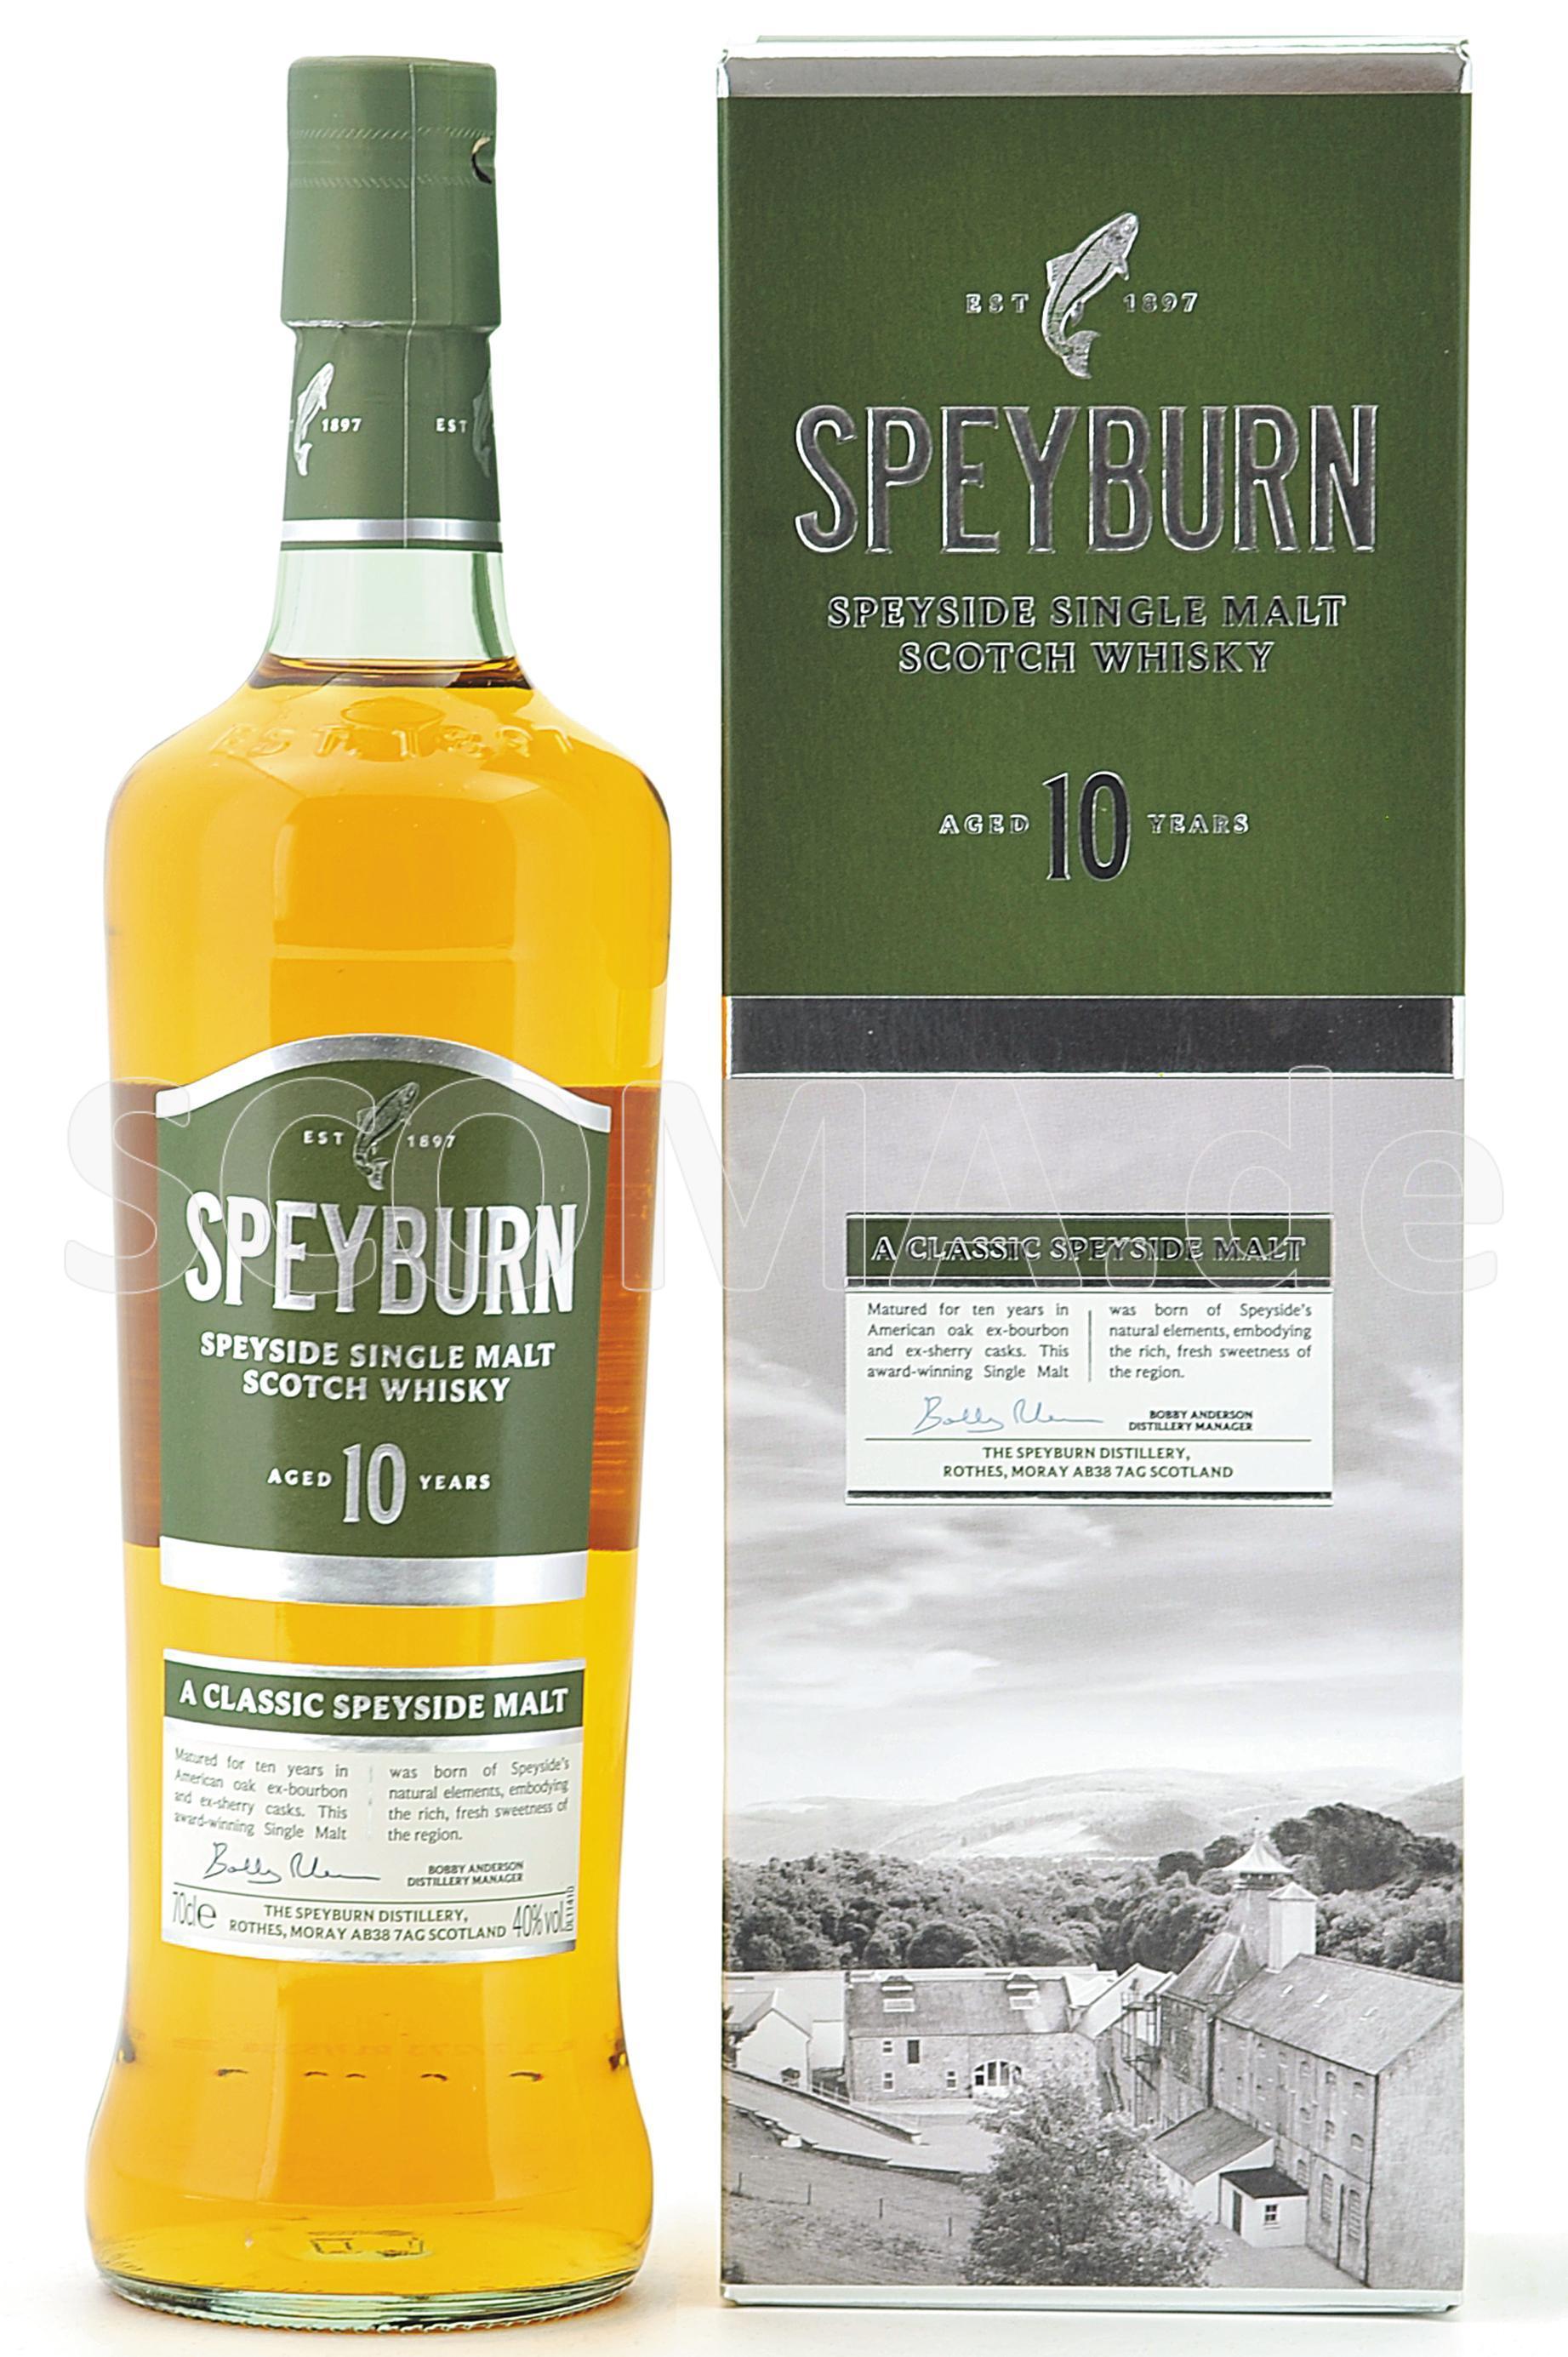 Speyburn 10 years